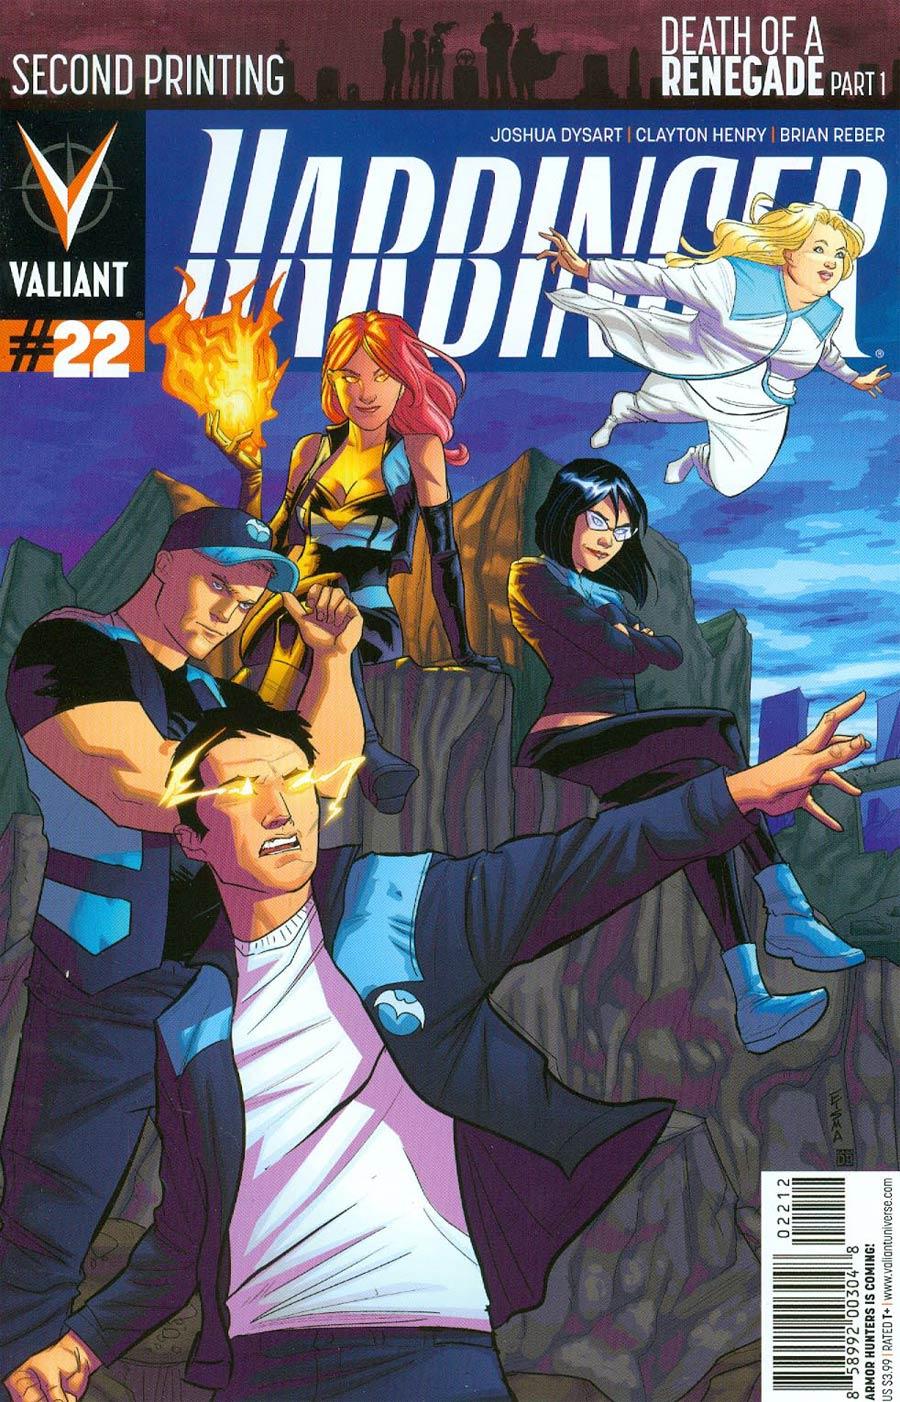 Harbinger Vol 2 #22 Cover D 2nd Ptg Michael Walsh Variant Cover